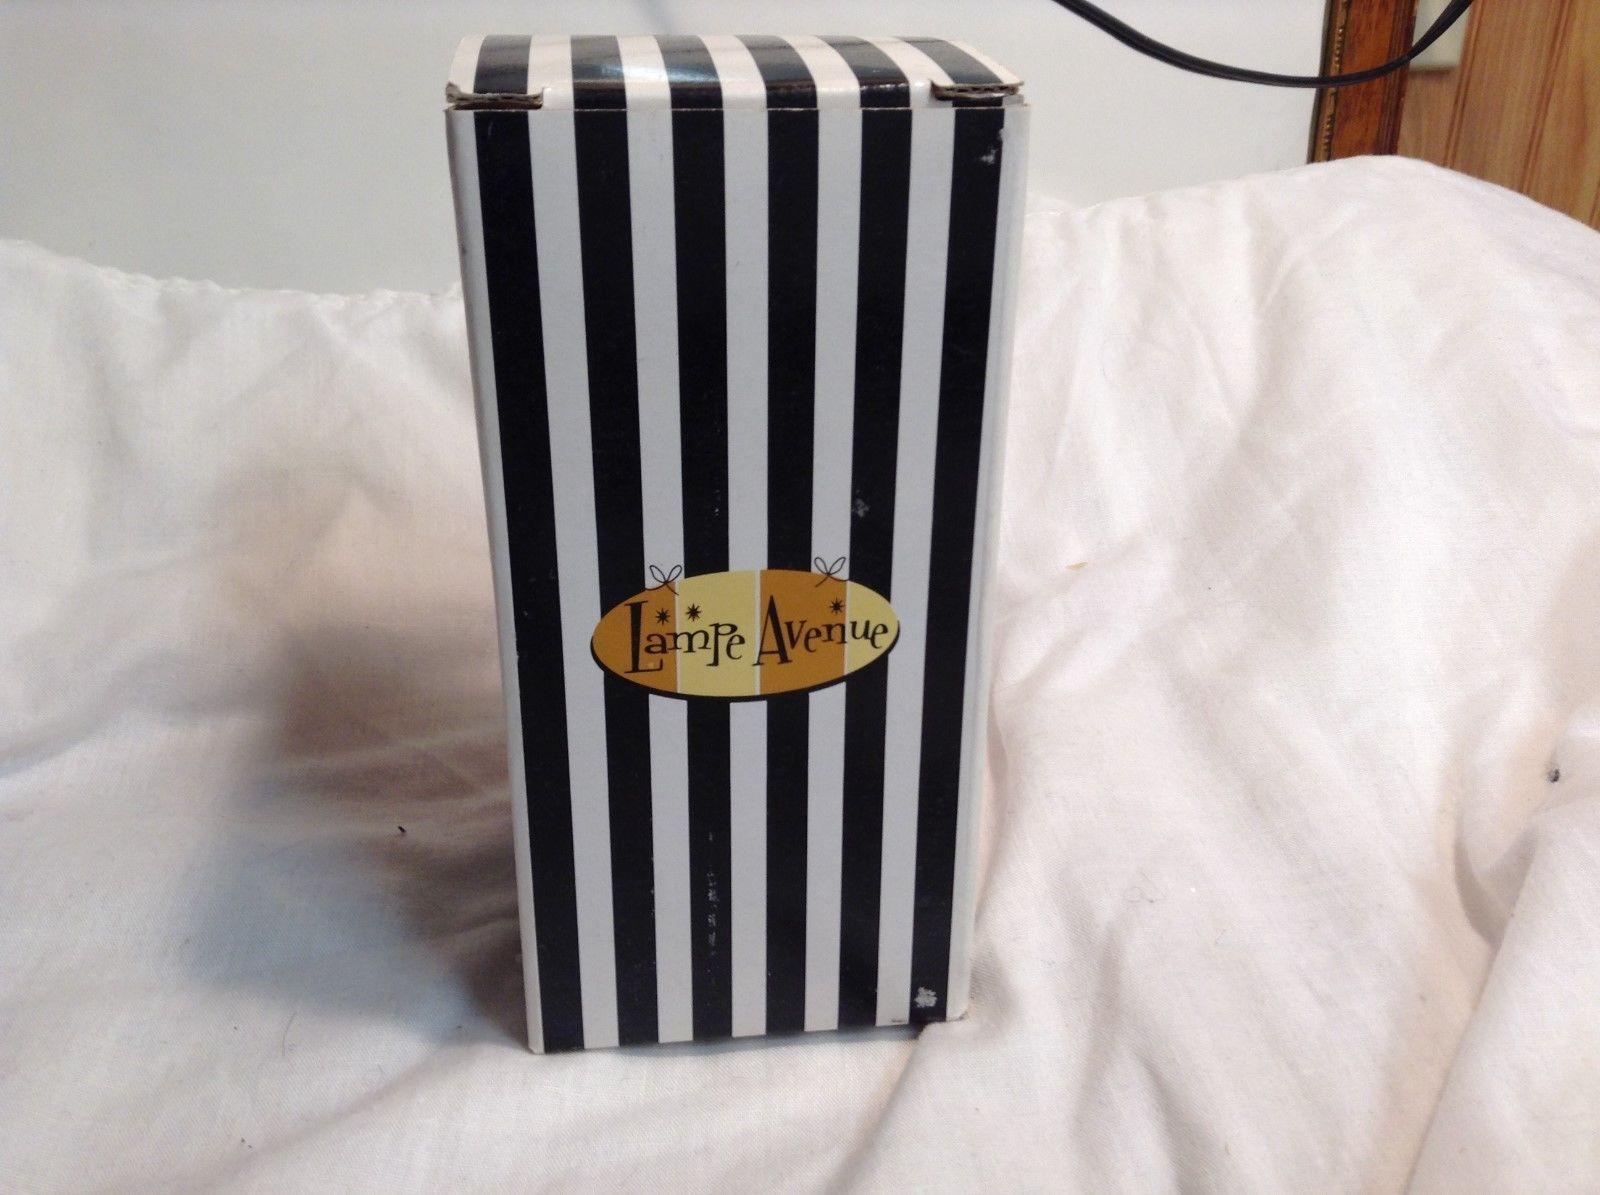 NEW Lampe Avenue Fashion Forward Fragrance Lamp in Black